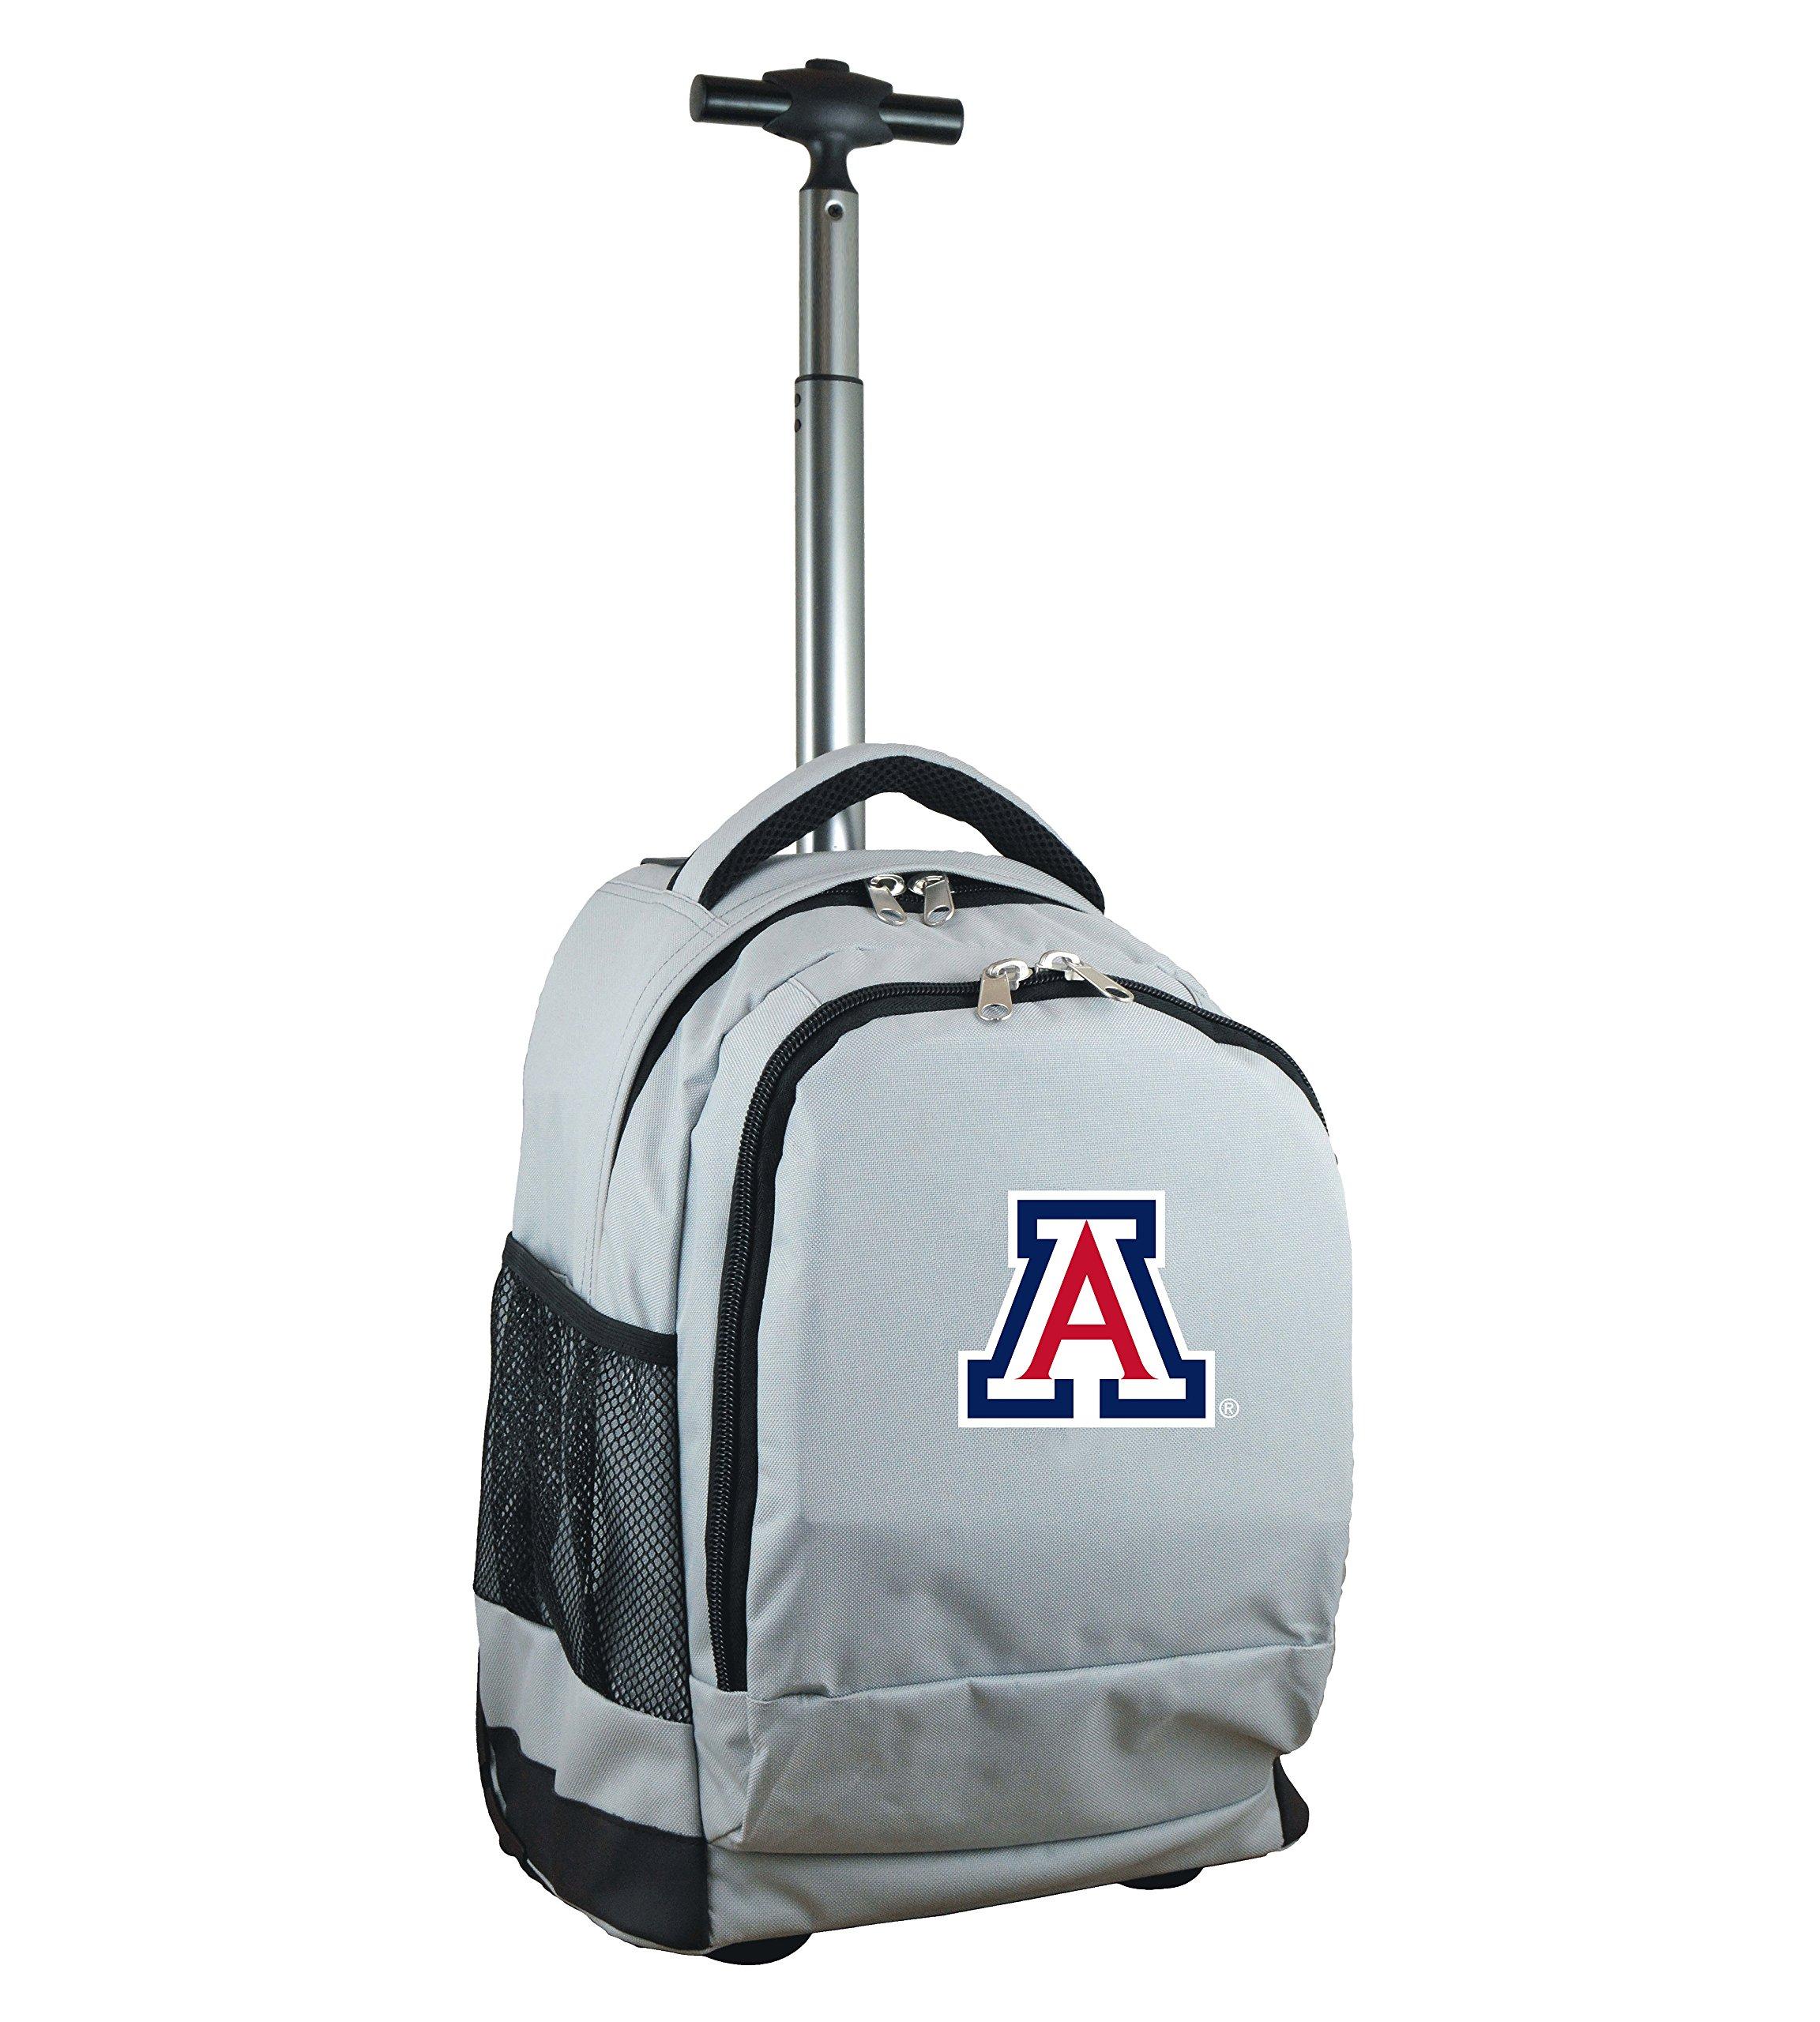 Denco NCAA Arizona Wildcats Expedition Wheeled Backpack, 19-inches, Grey by Denco (Image #1)